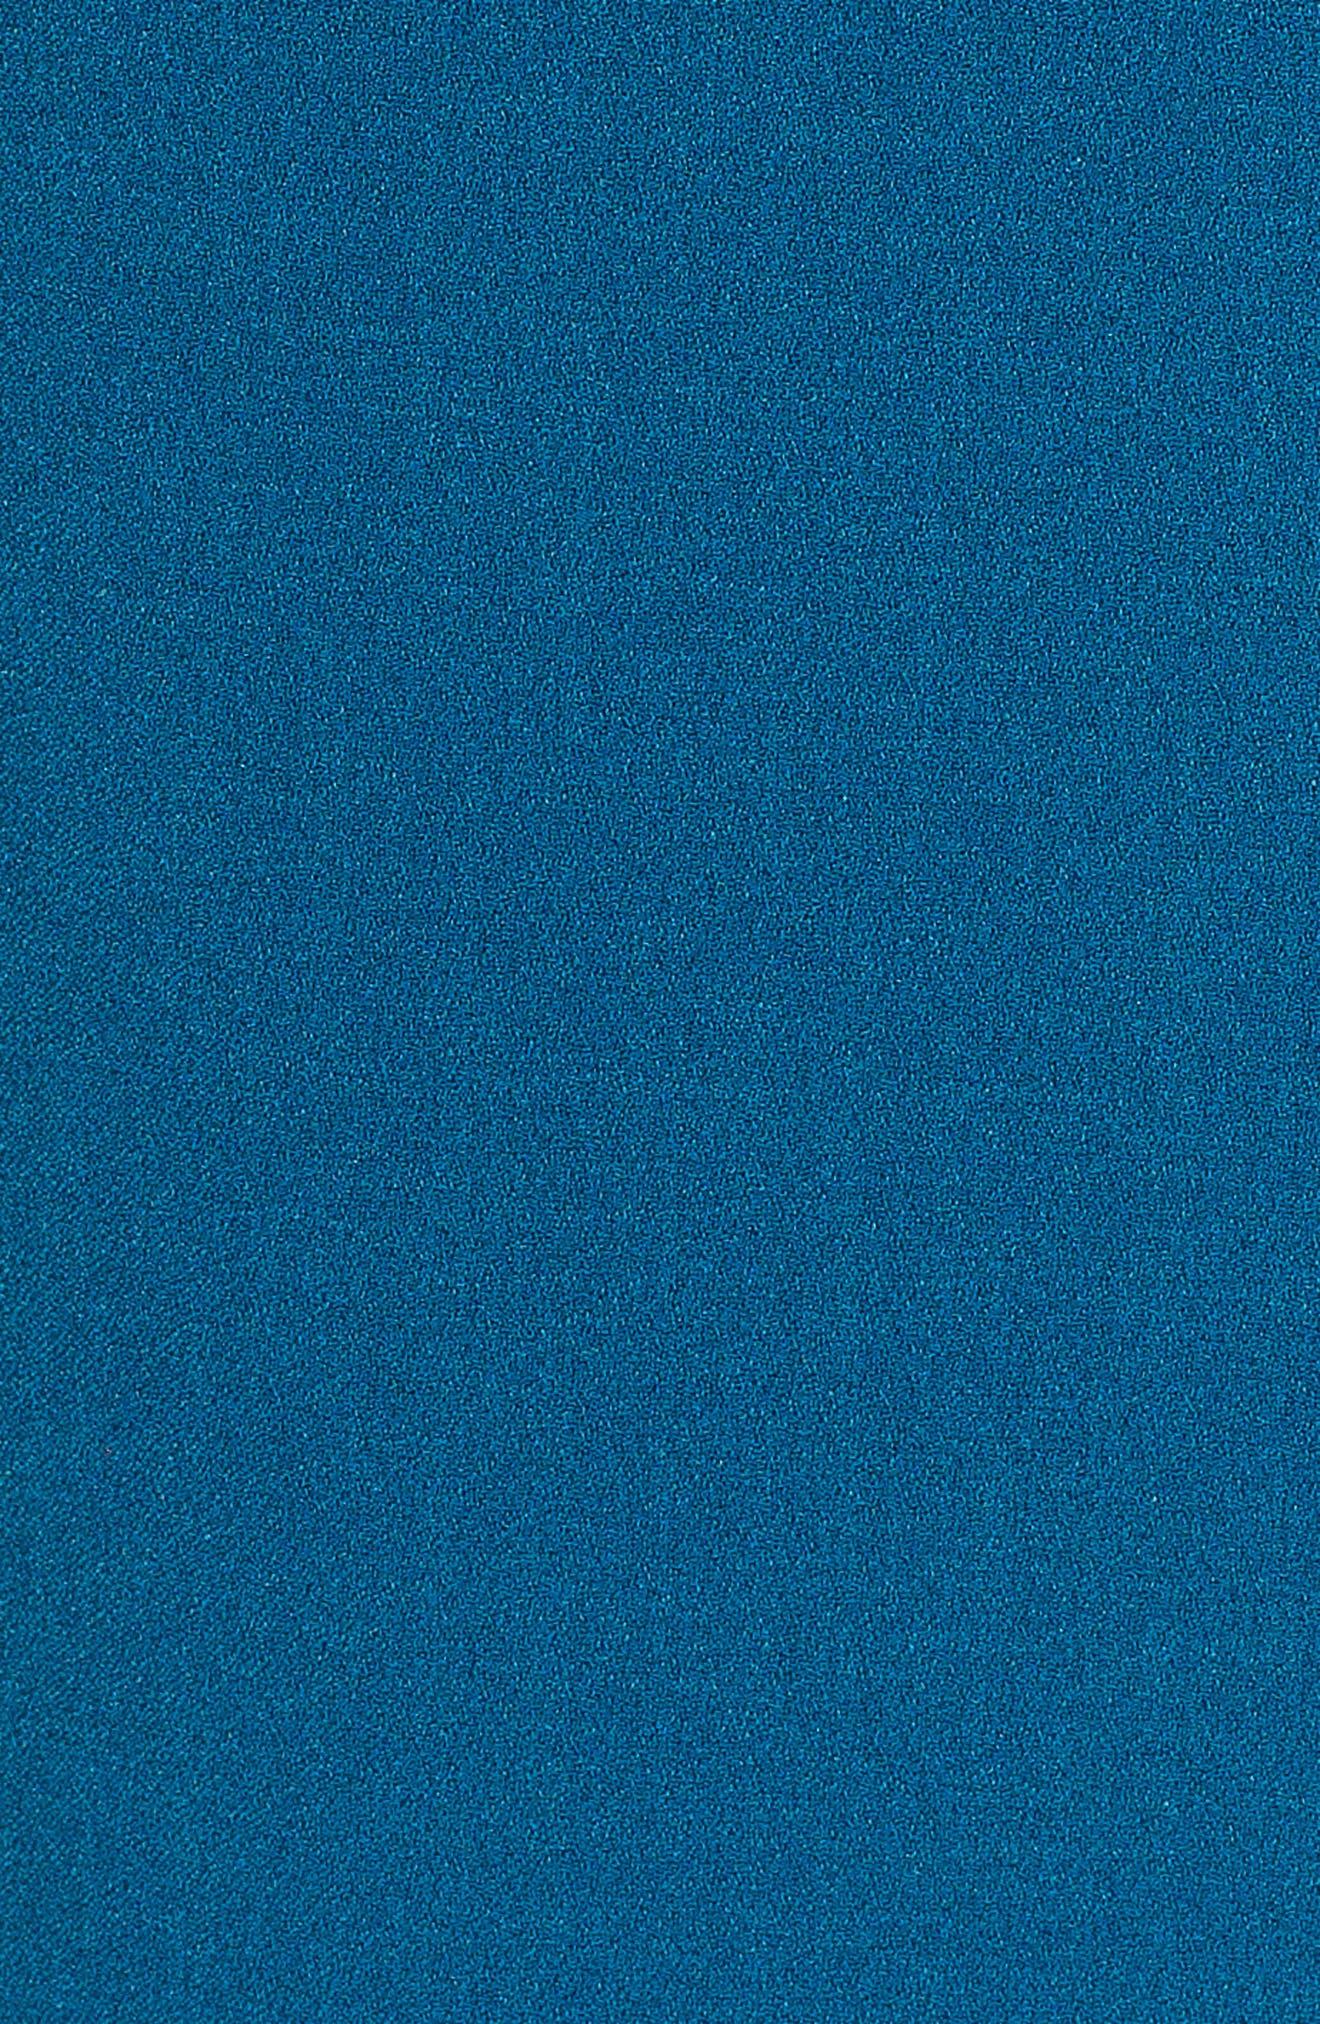 Ruffle Sleeve Sheath Dress,                             Alternate thumbnail 6, color,                             TEAL